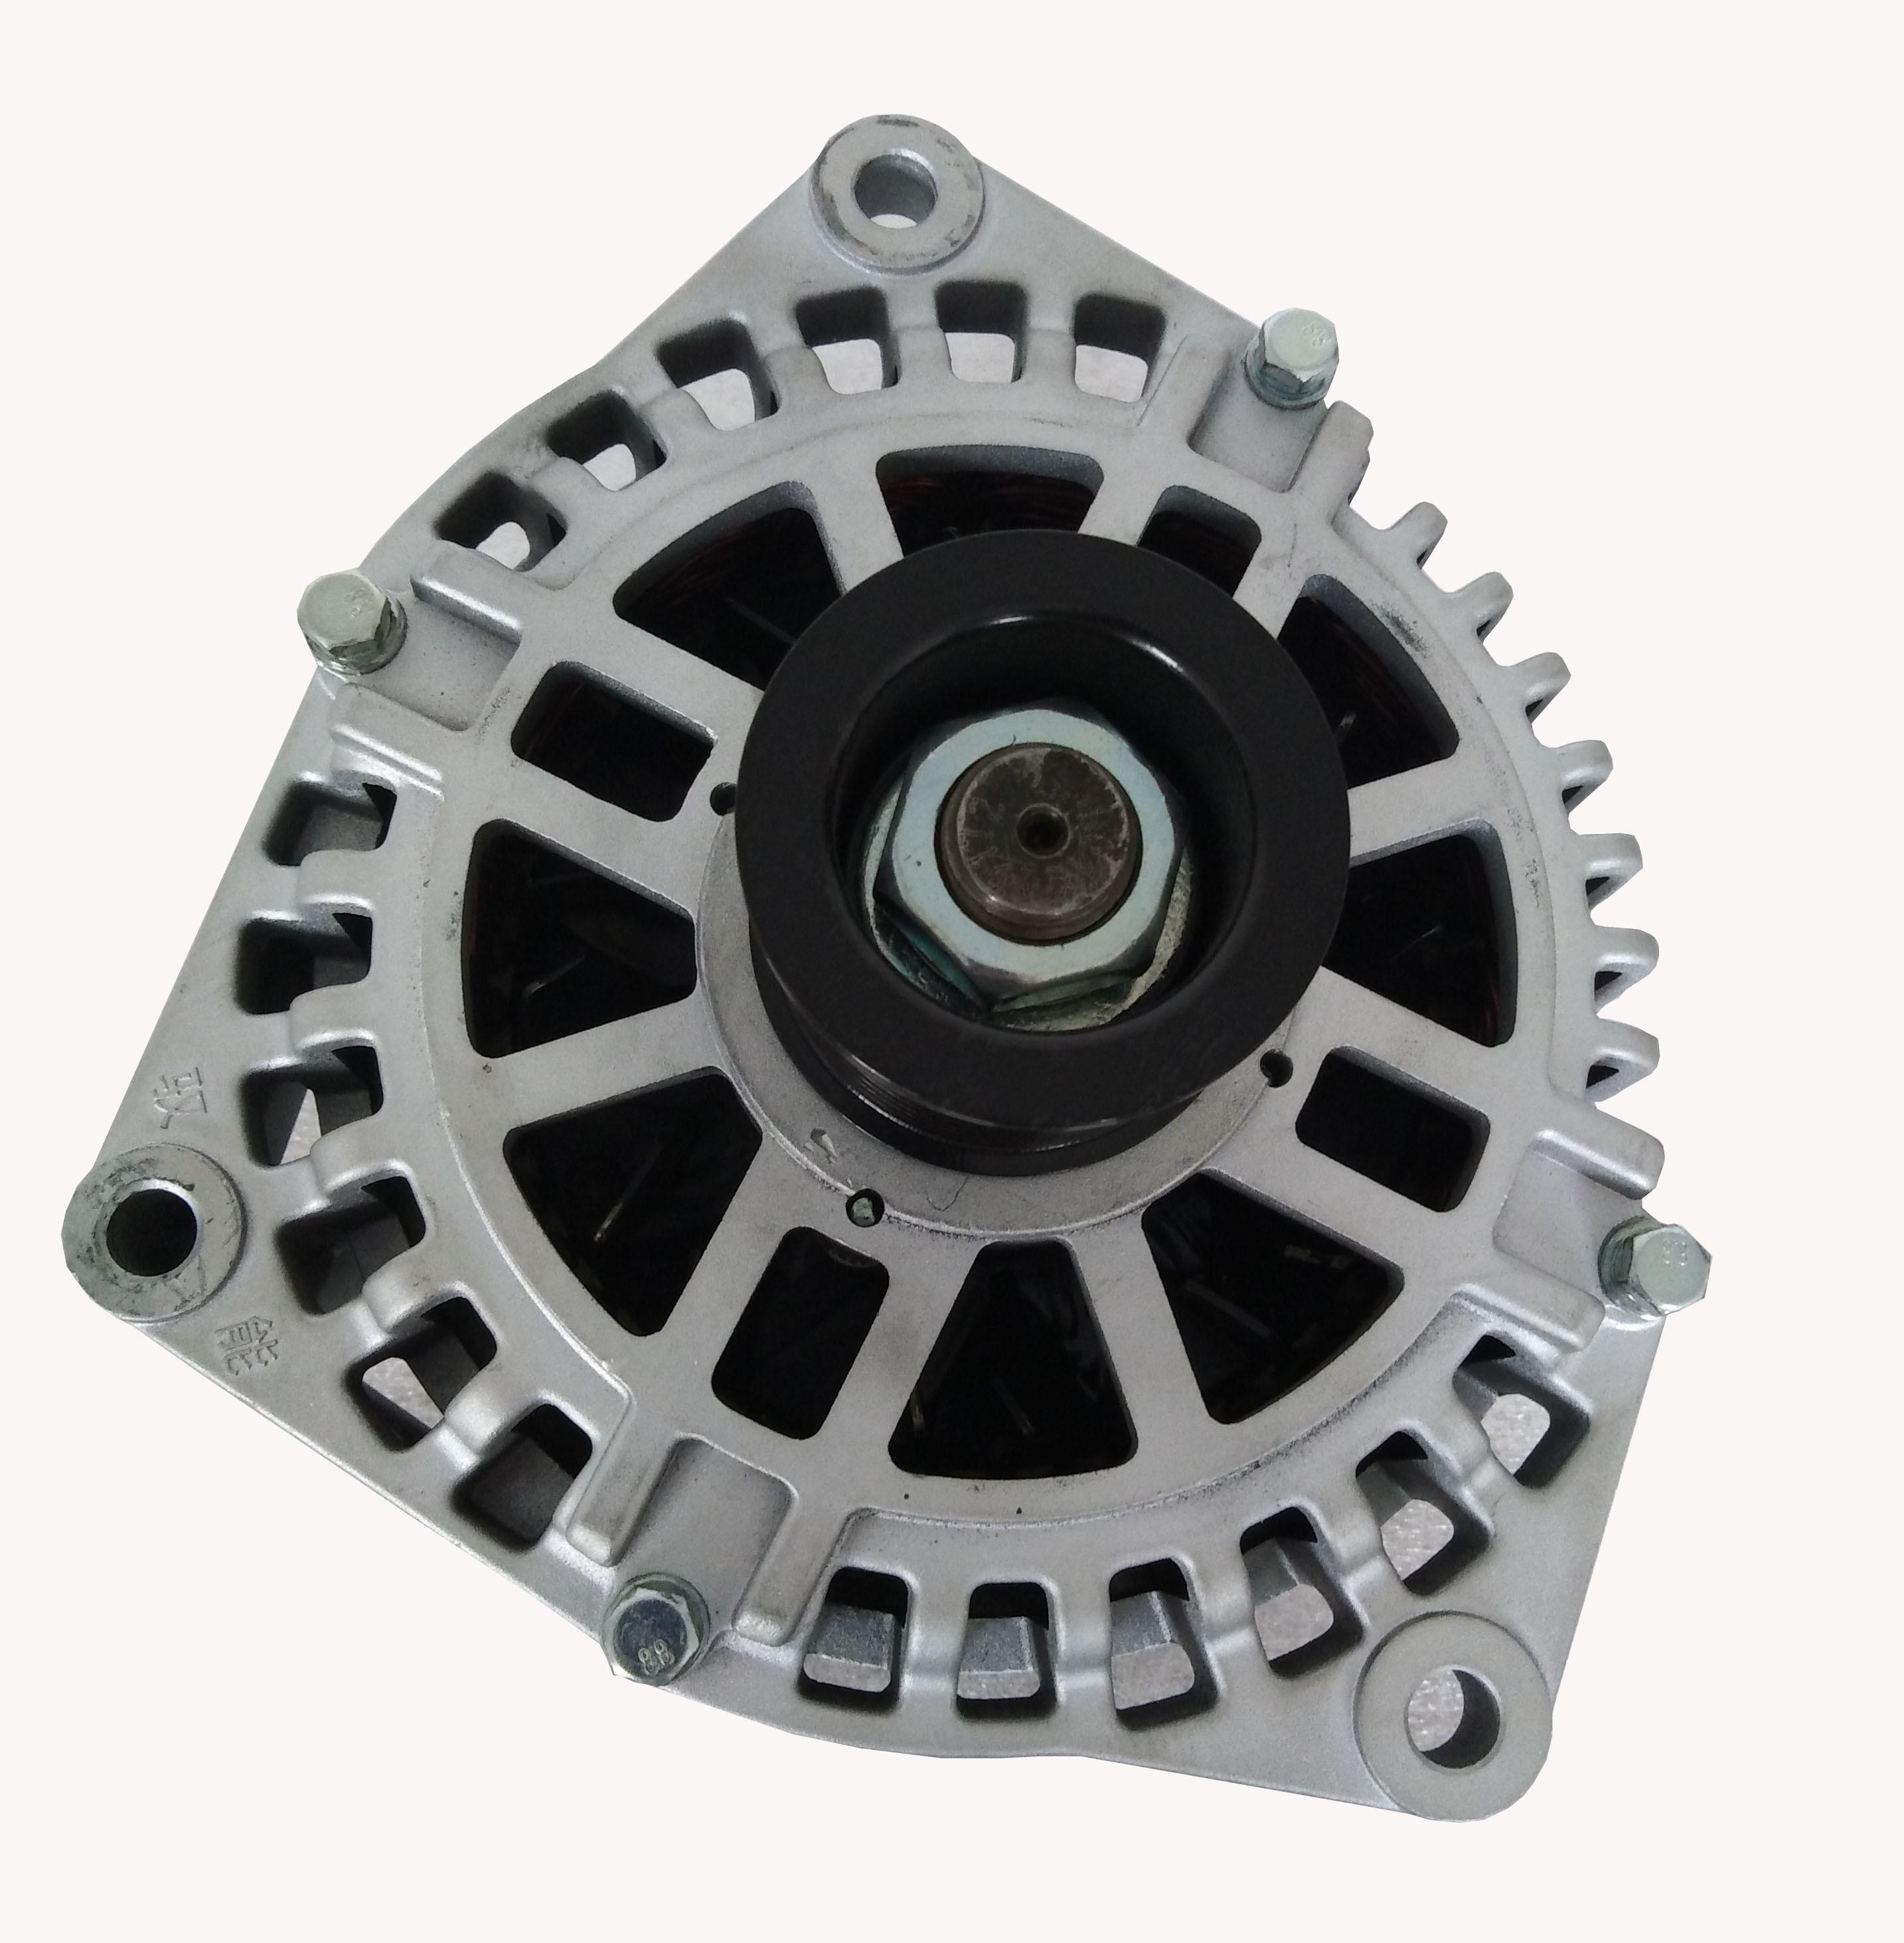 WP7 Engine 28V 240A Alternator